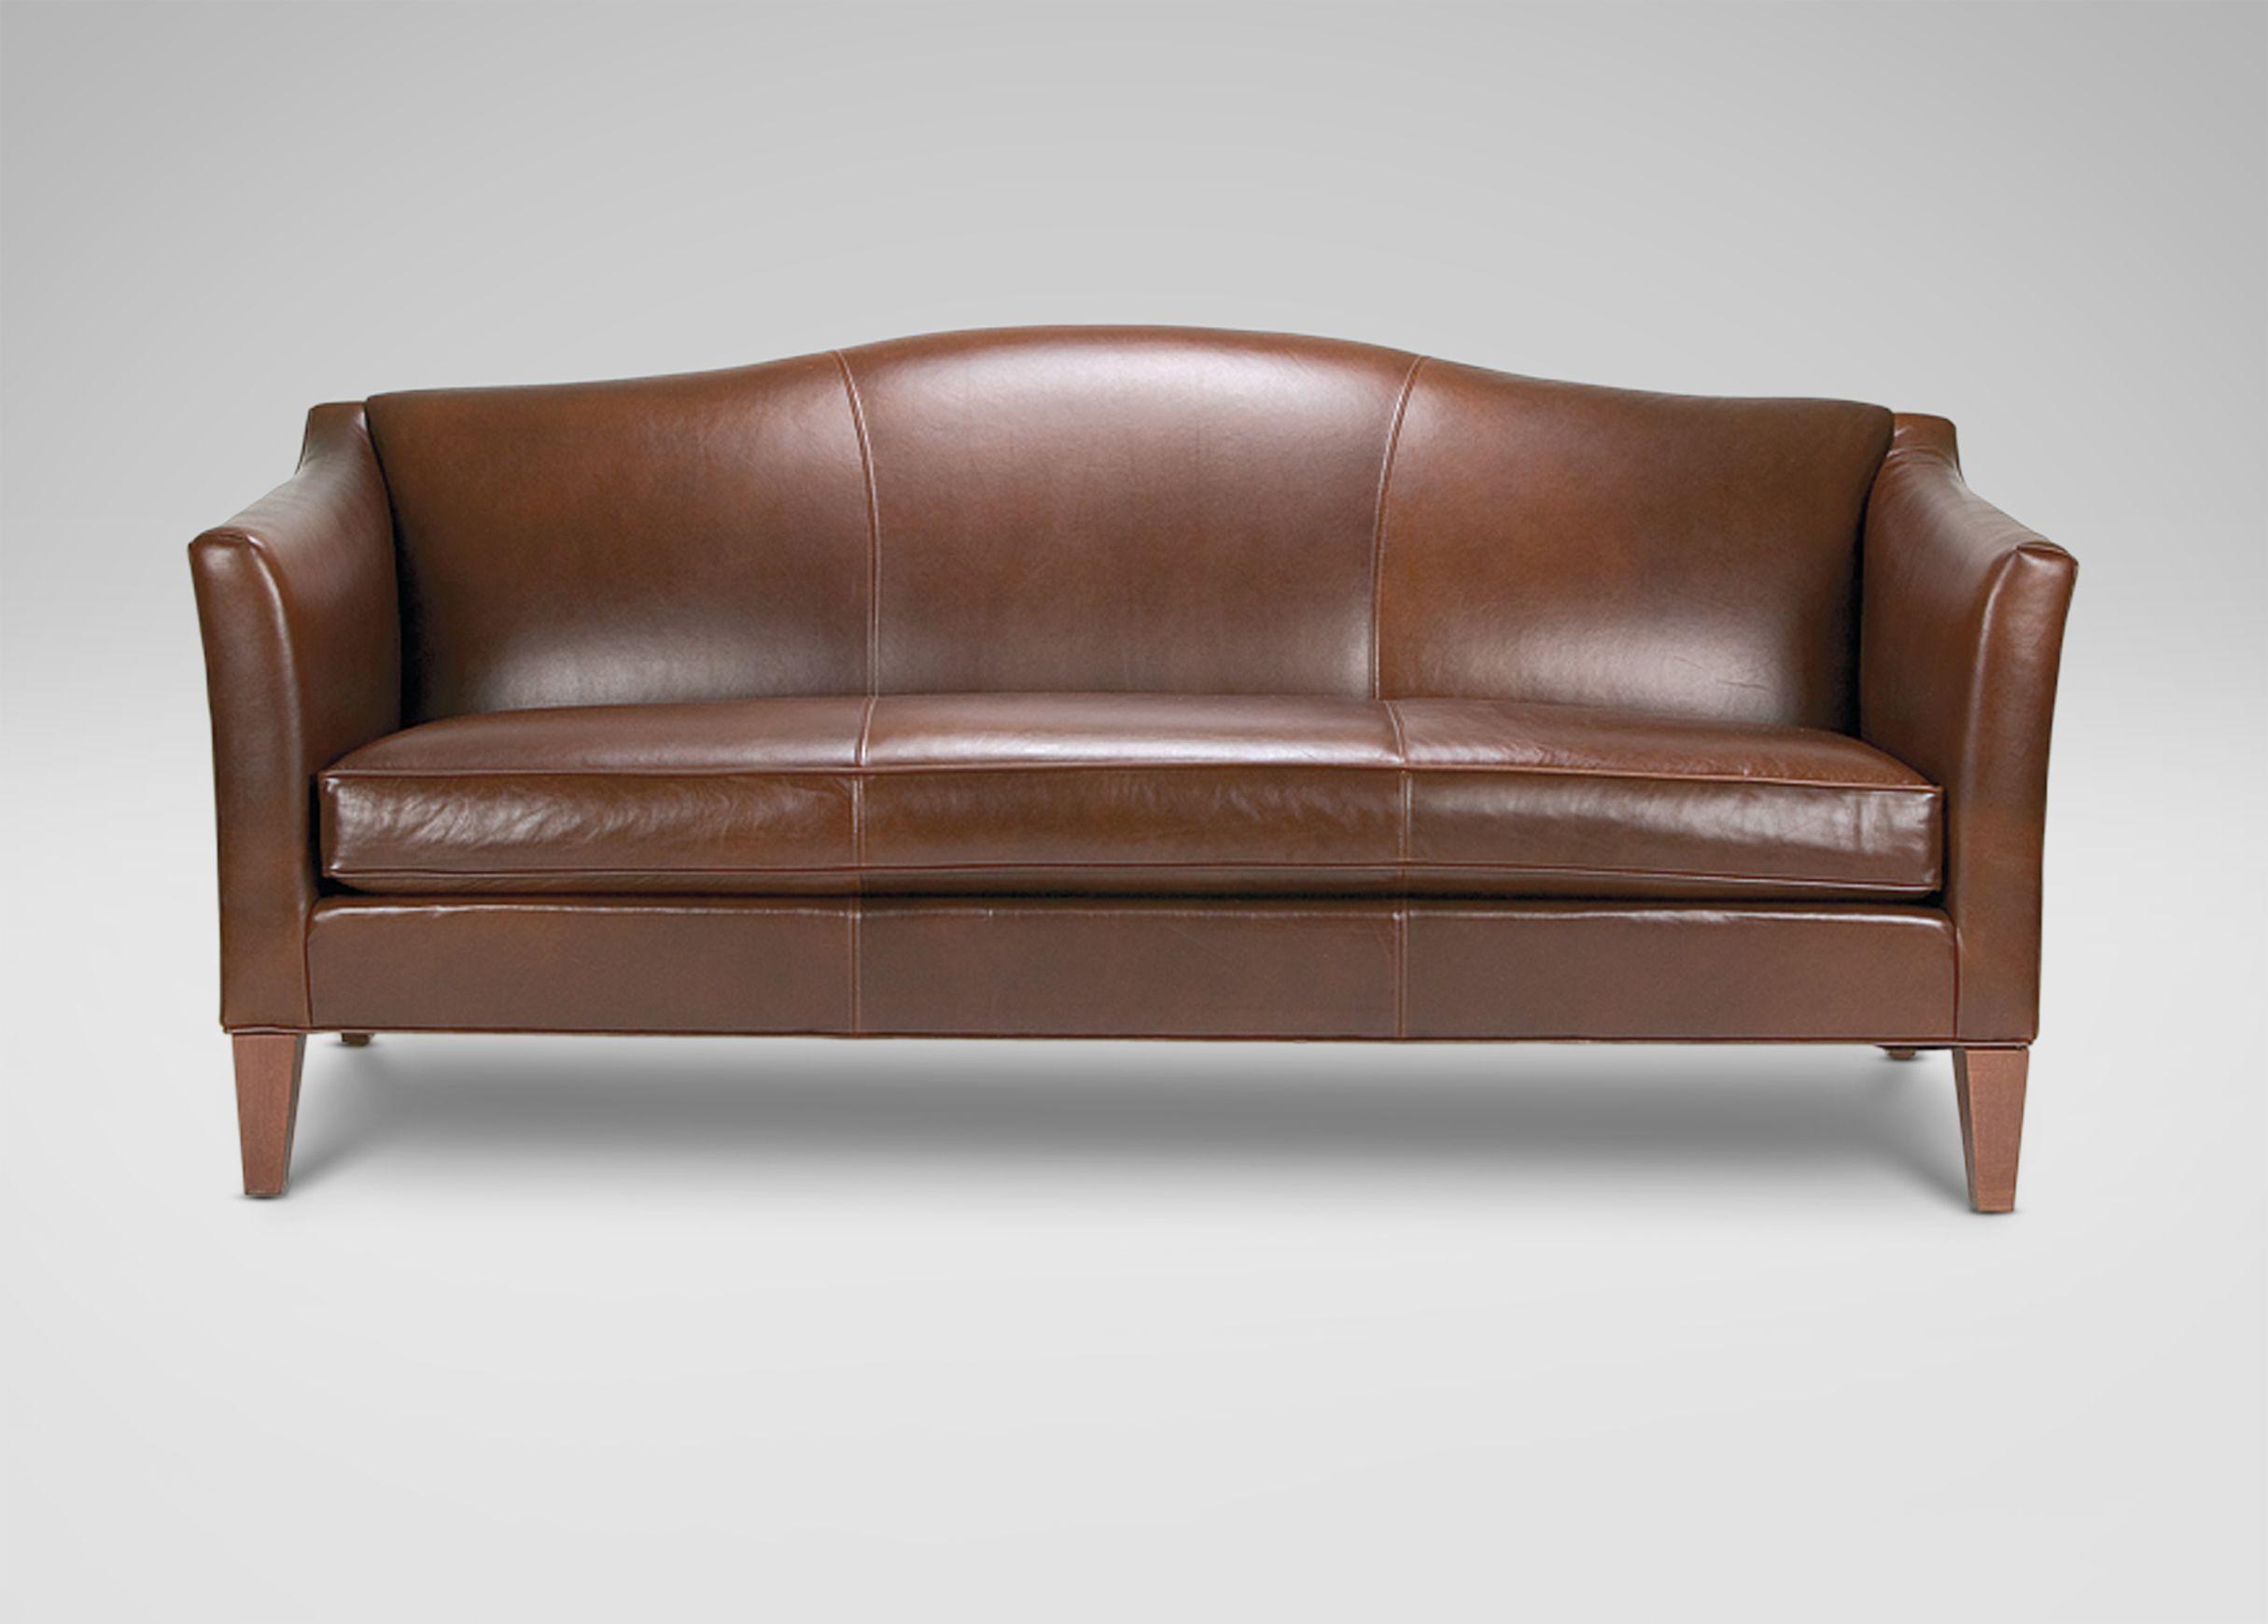 Hartwell Bench Cushion Leather Sofa Ethan Allen Sofa Sleek